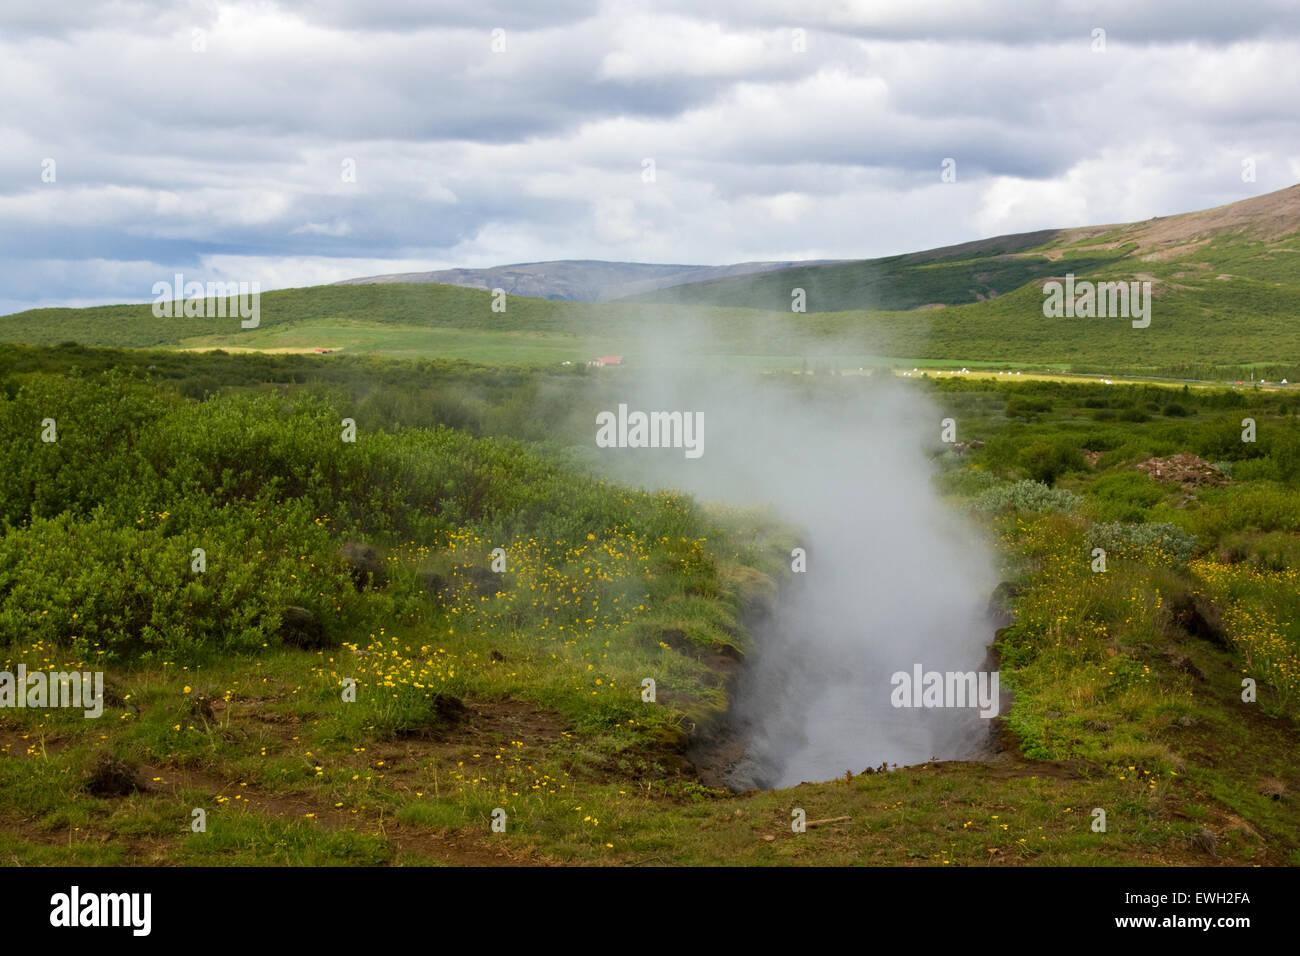 Hot spring in southwestern Iceland - Stock Image